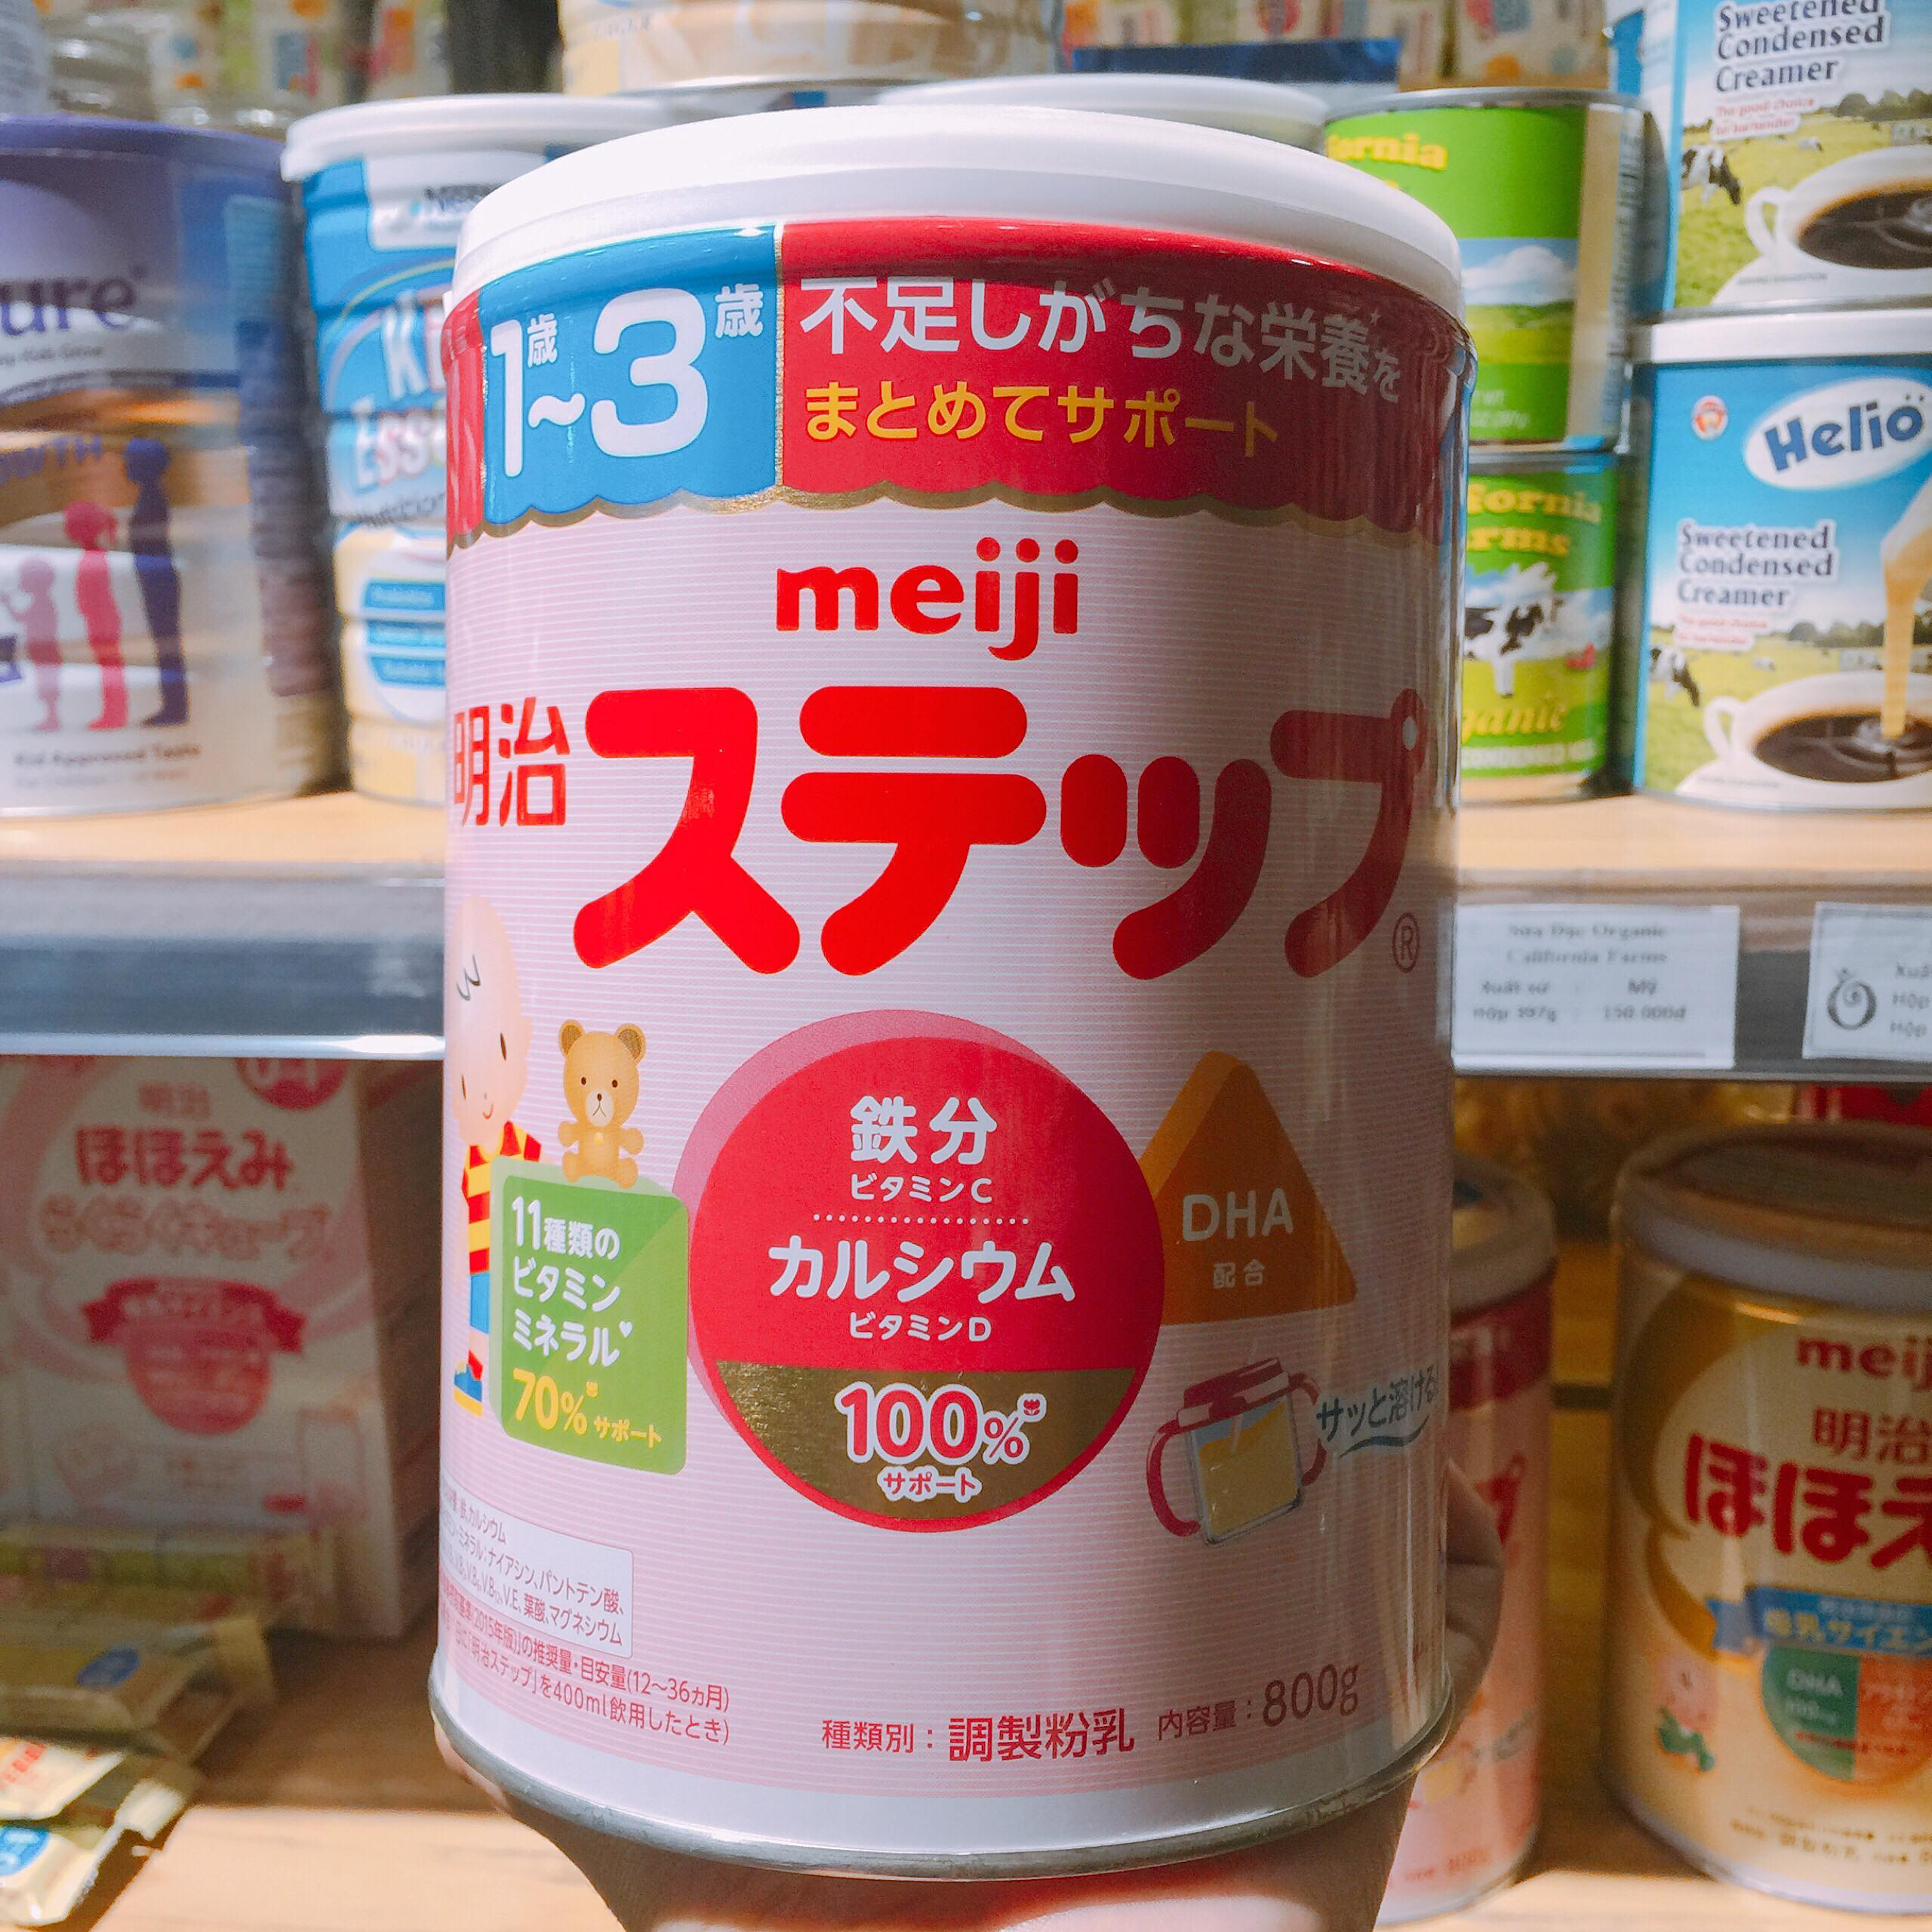 Sữa meiji chính hãng - Sữa Meiji nội địa nhật